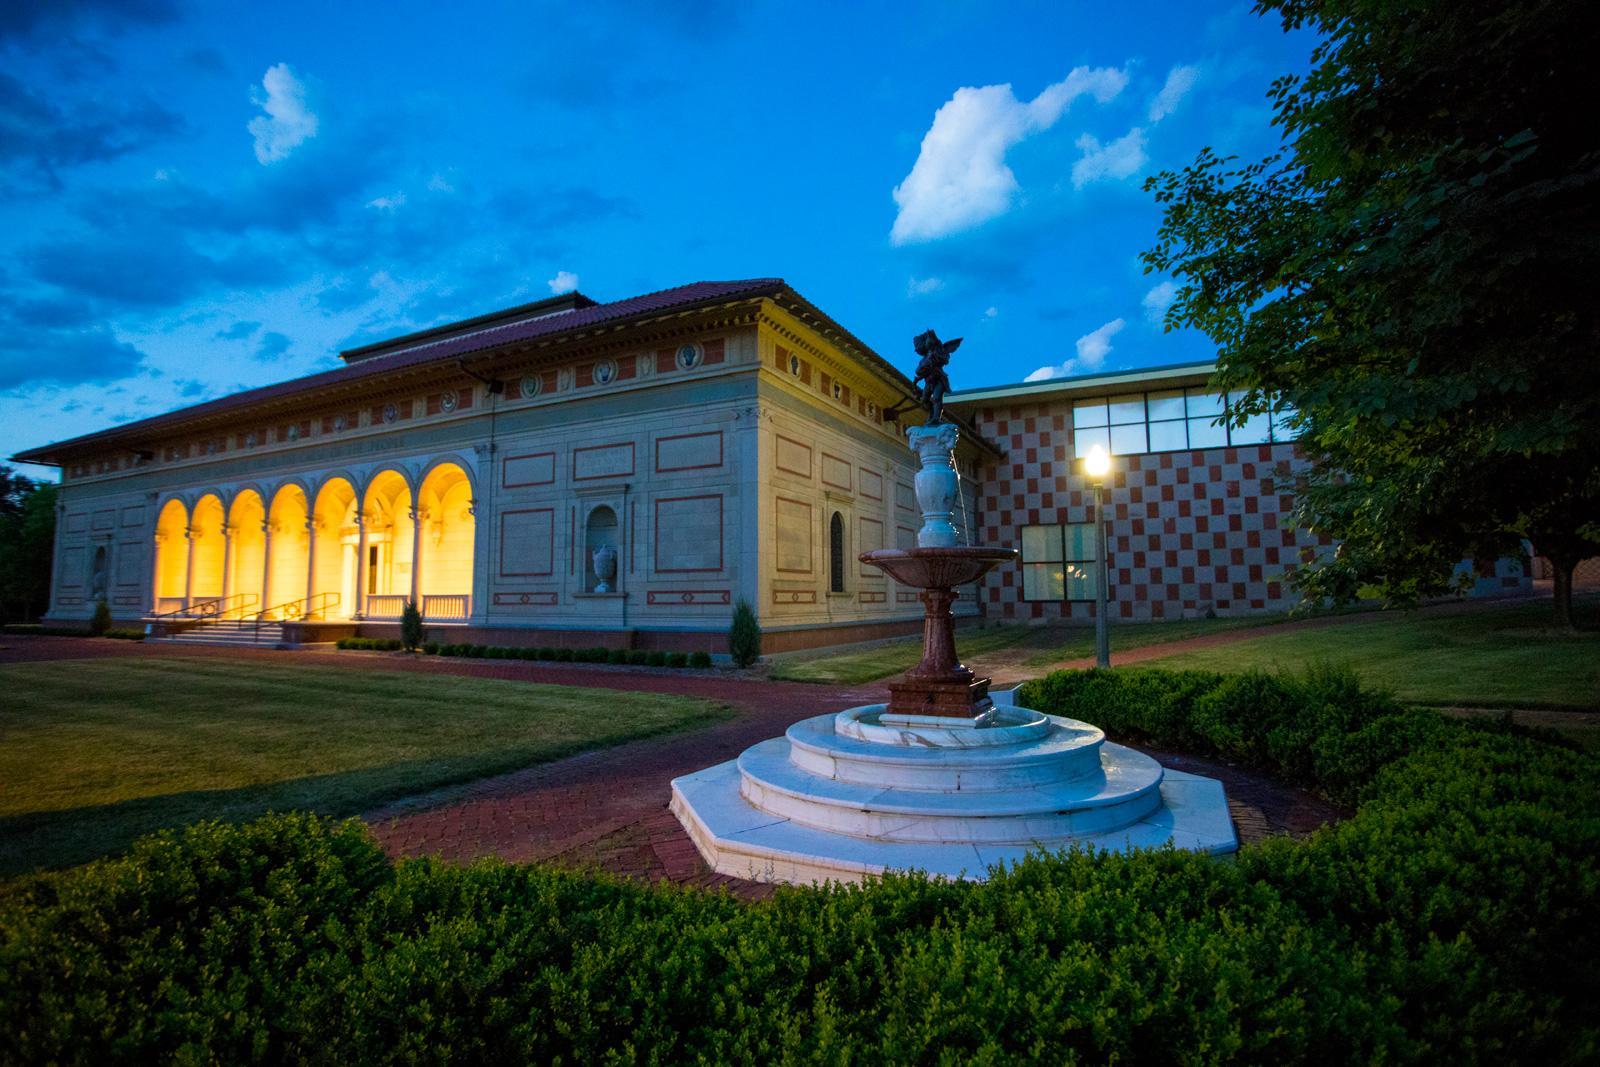 The Allen Museum at dusk.